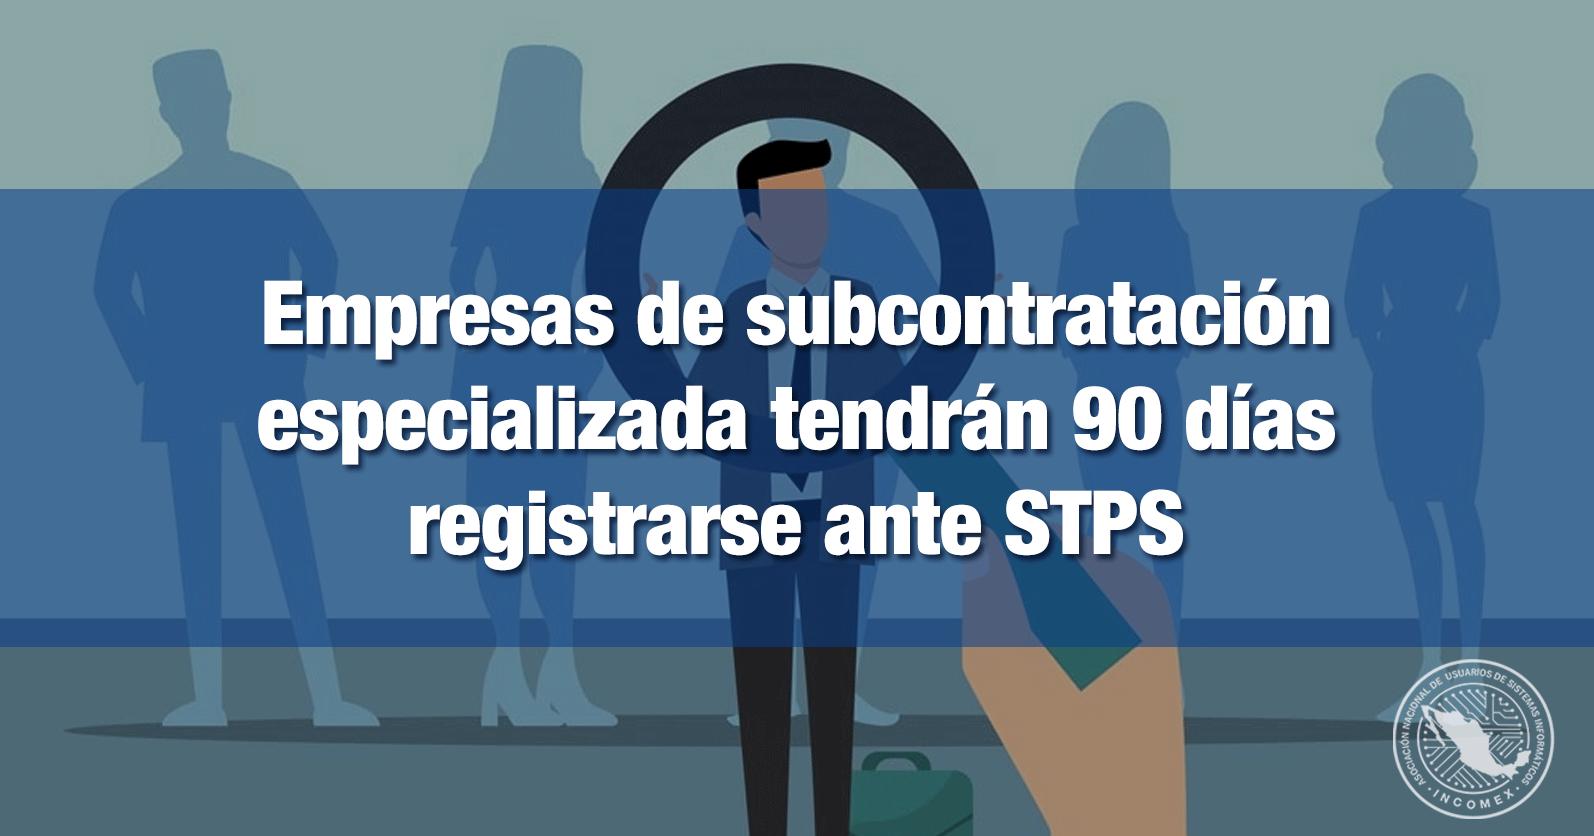 Empresas de subcontratación especializada tendrán 90 días registrarse ante STPS